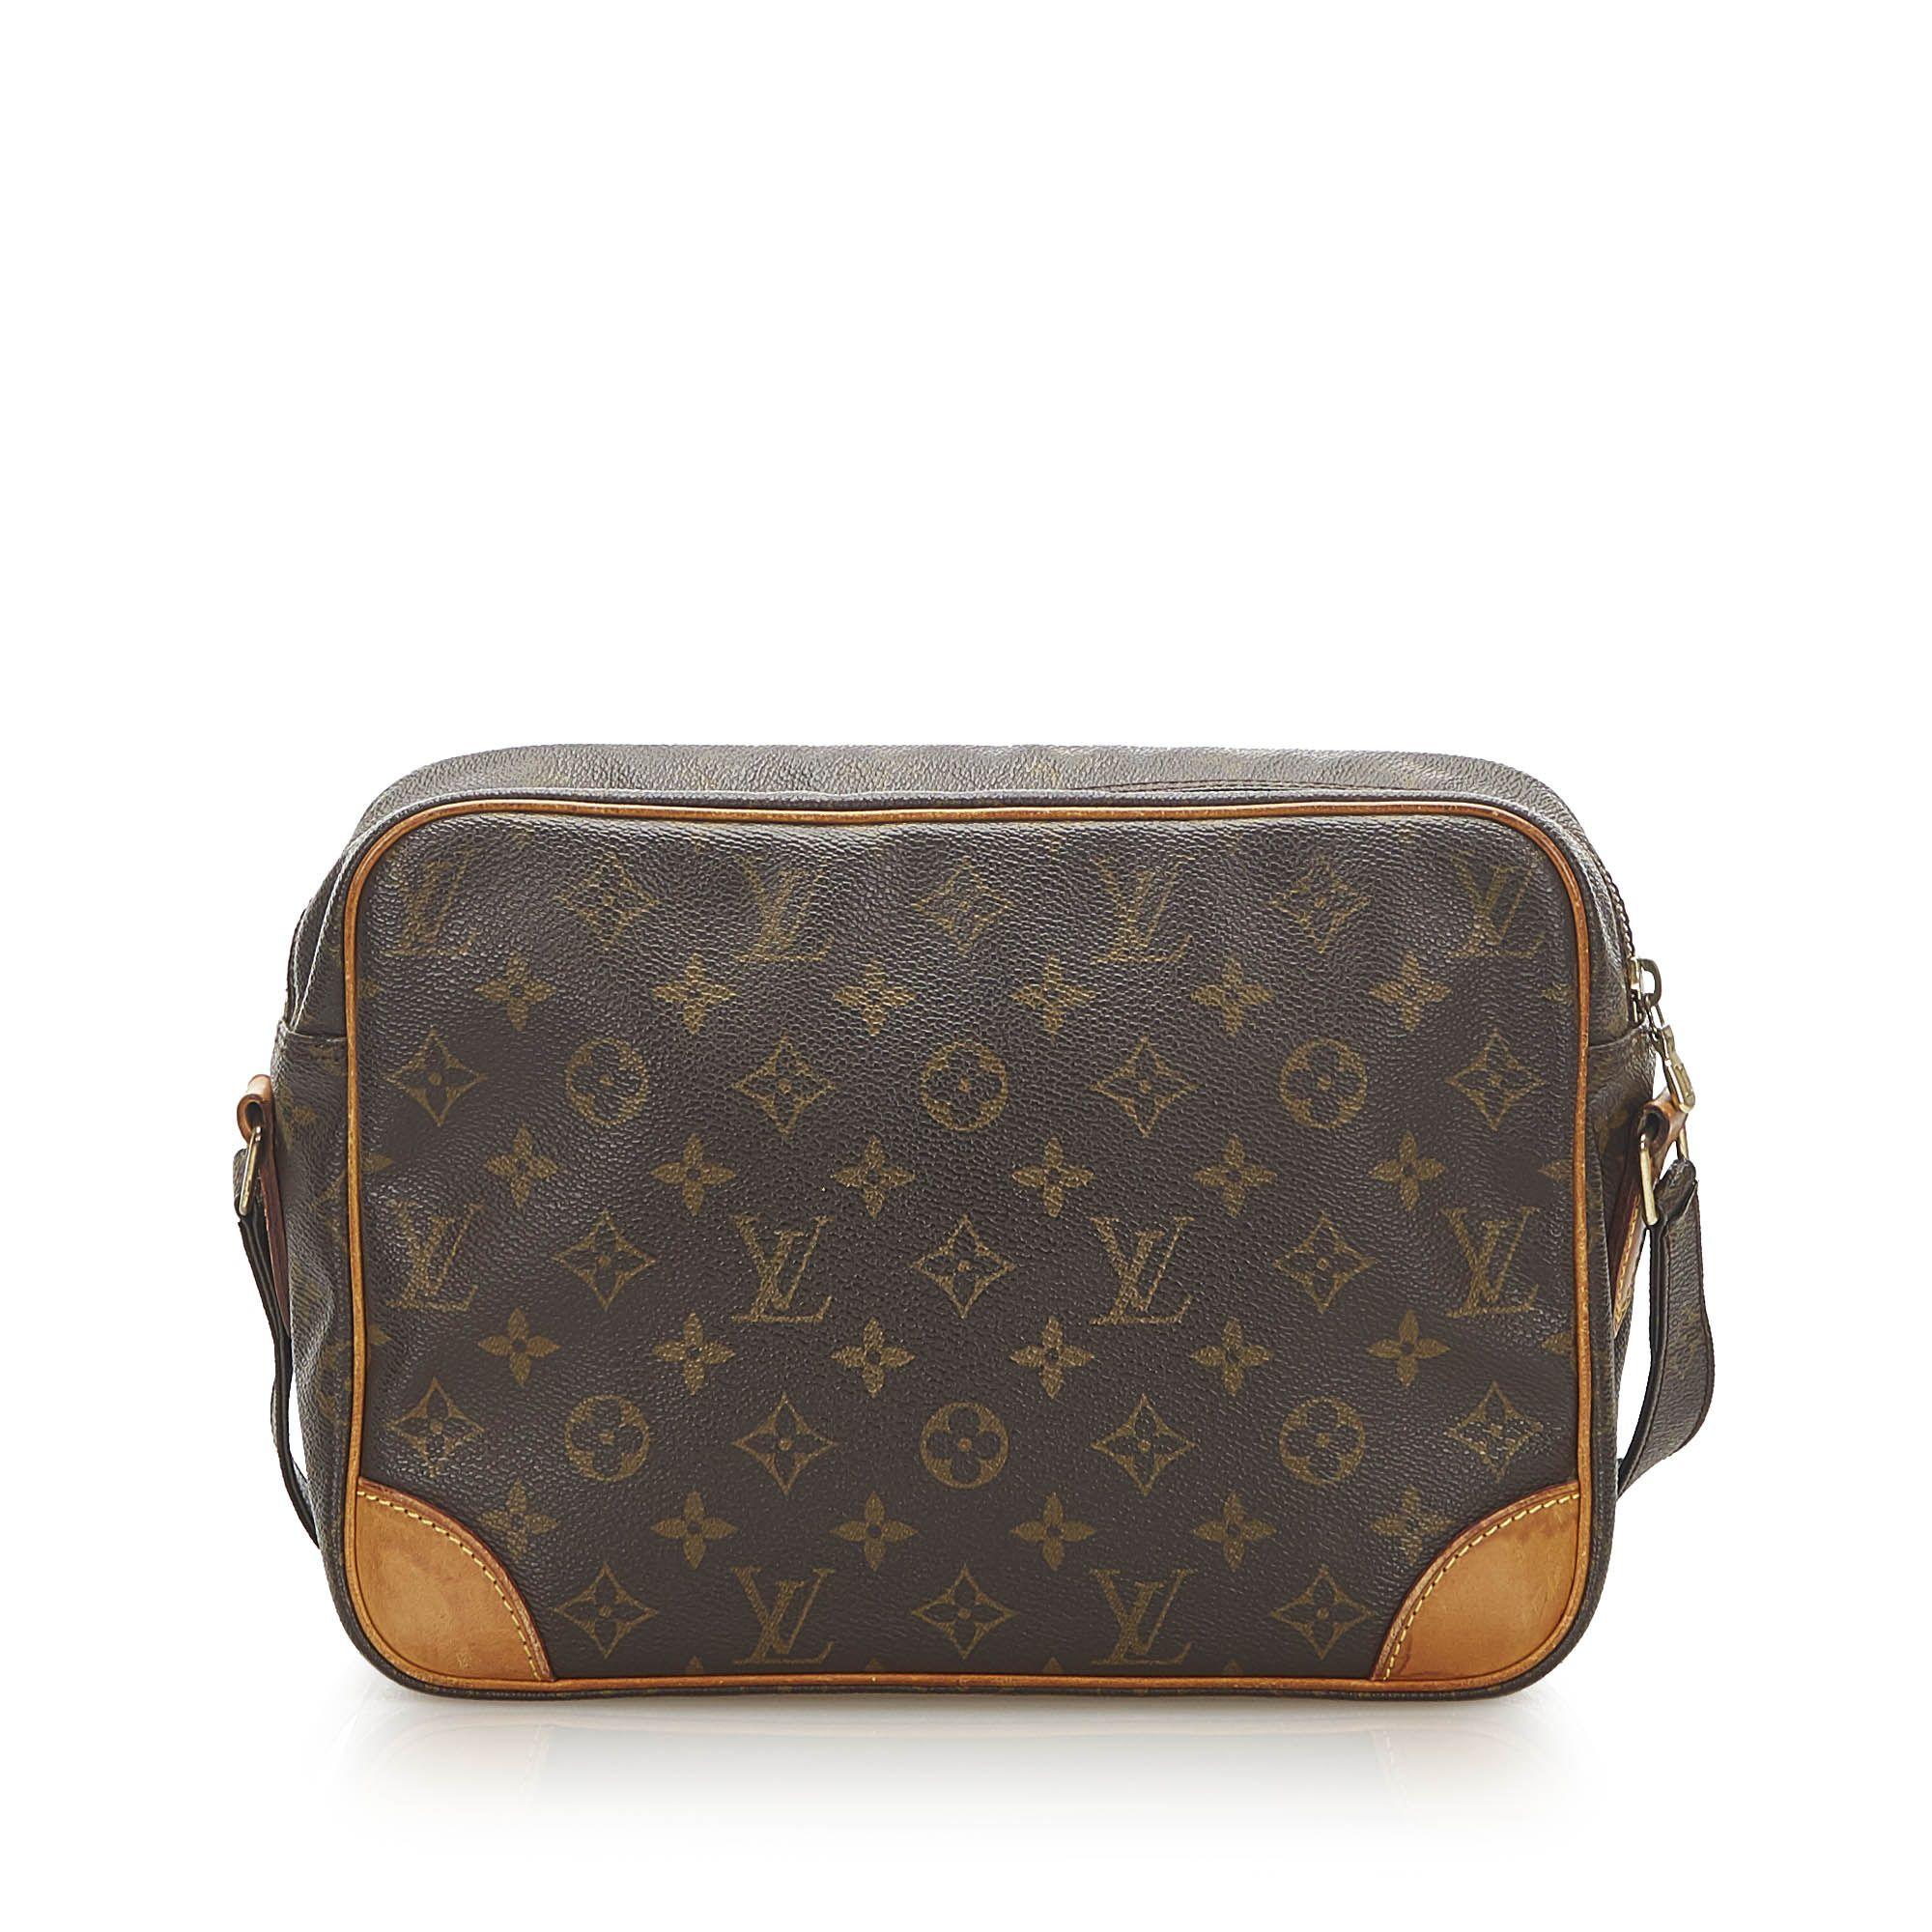 Vintage Louis Vuitton Monogram Nile Brown